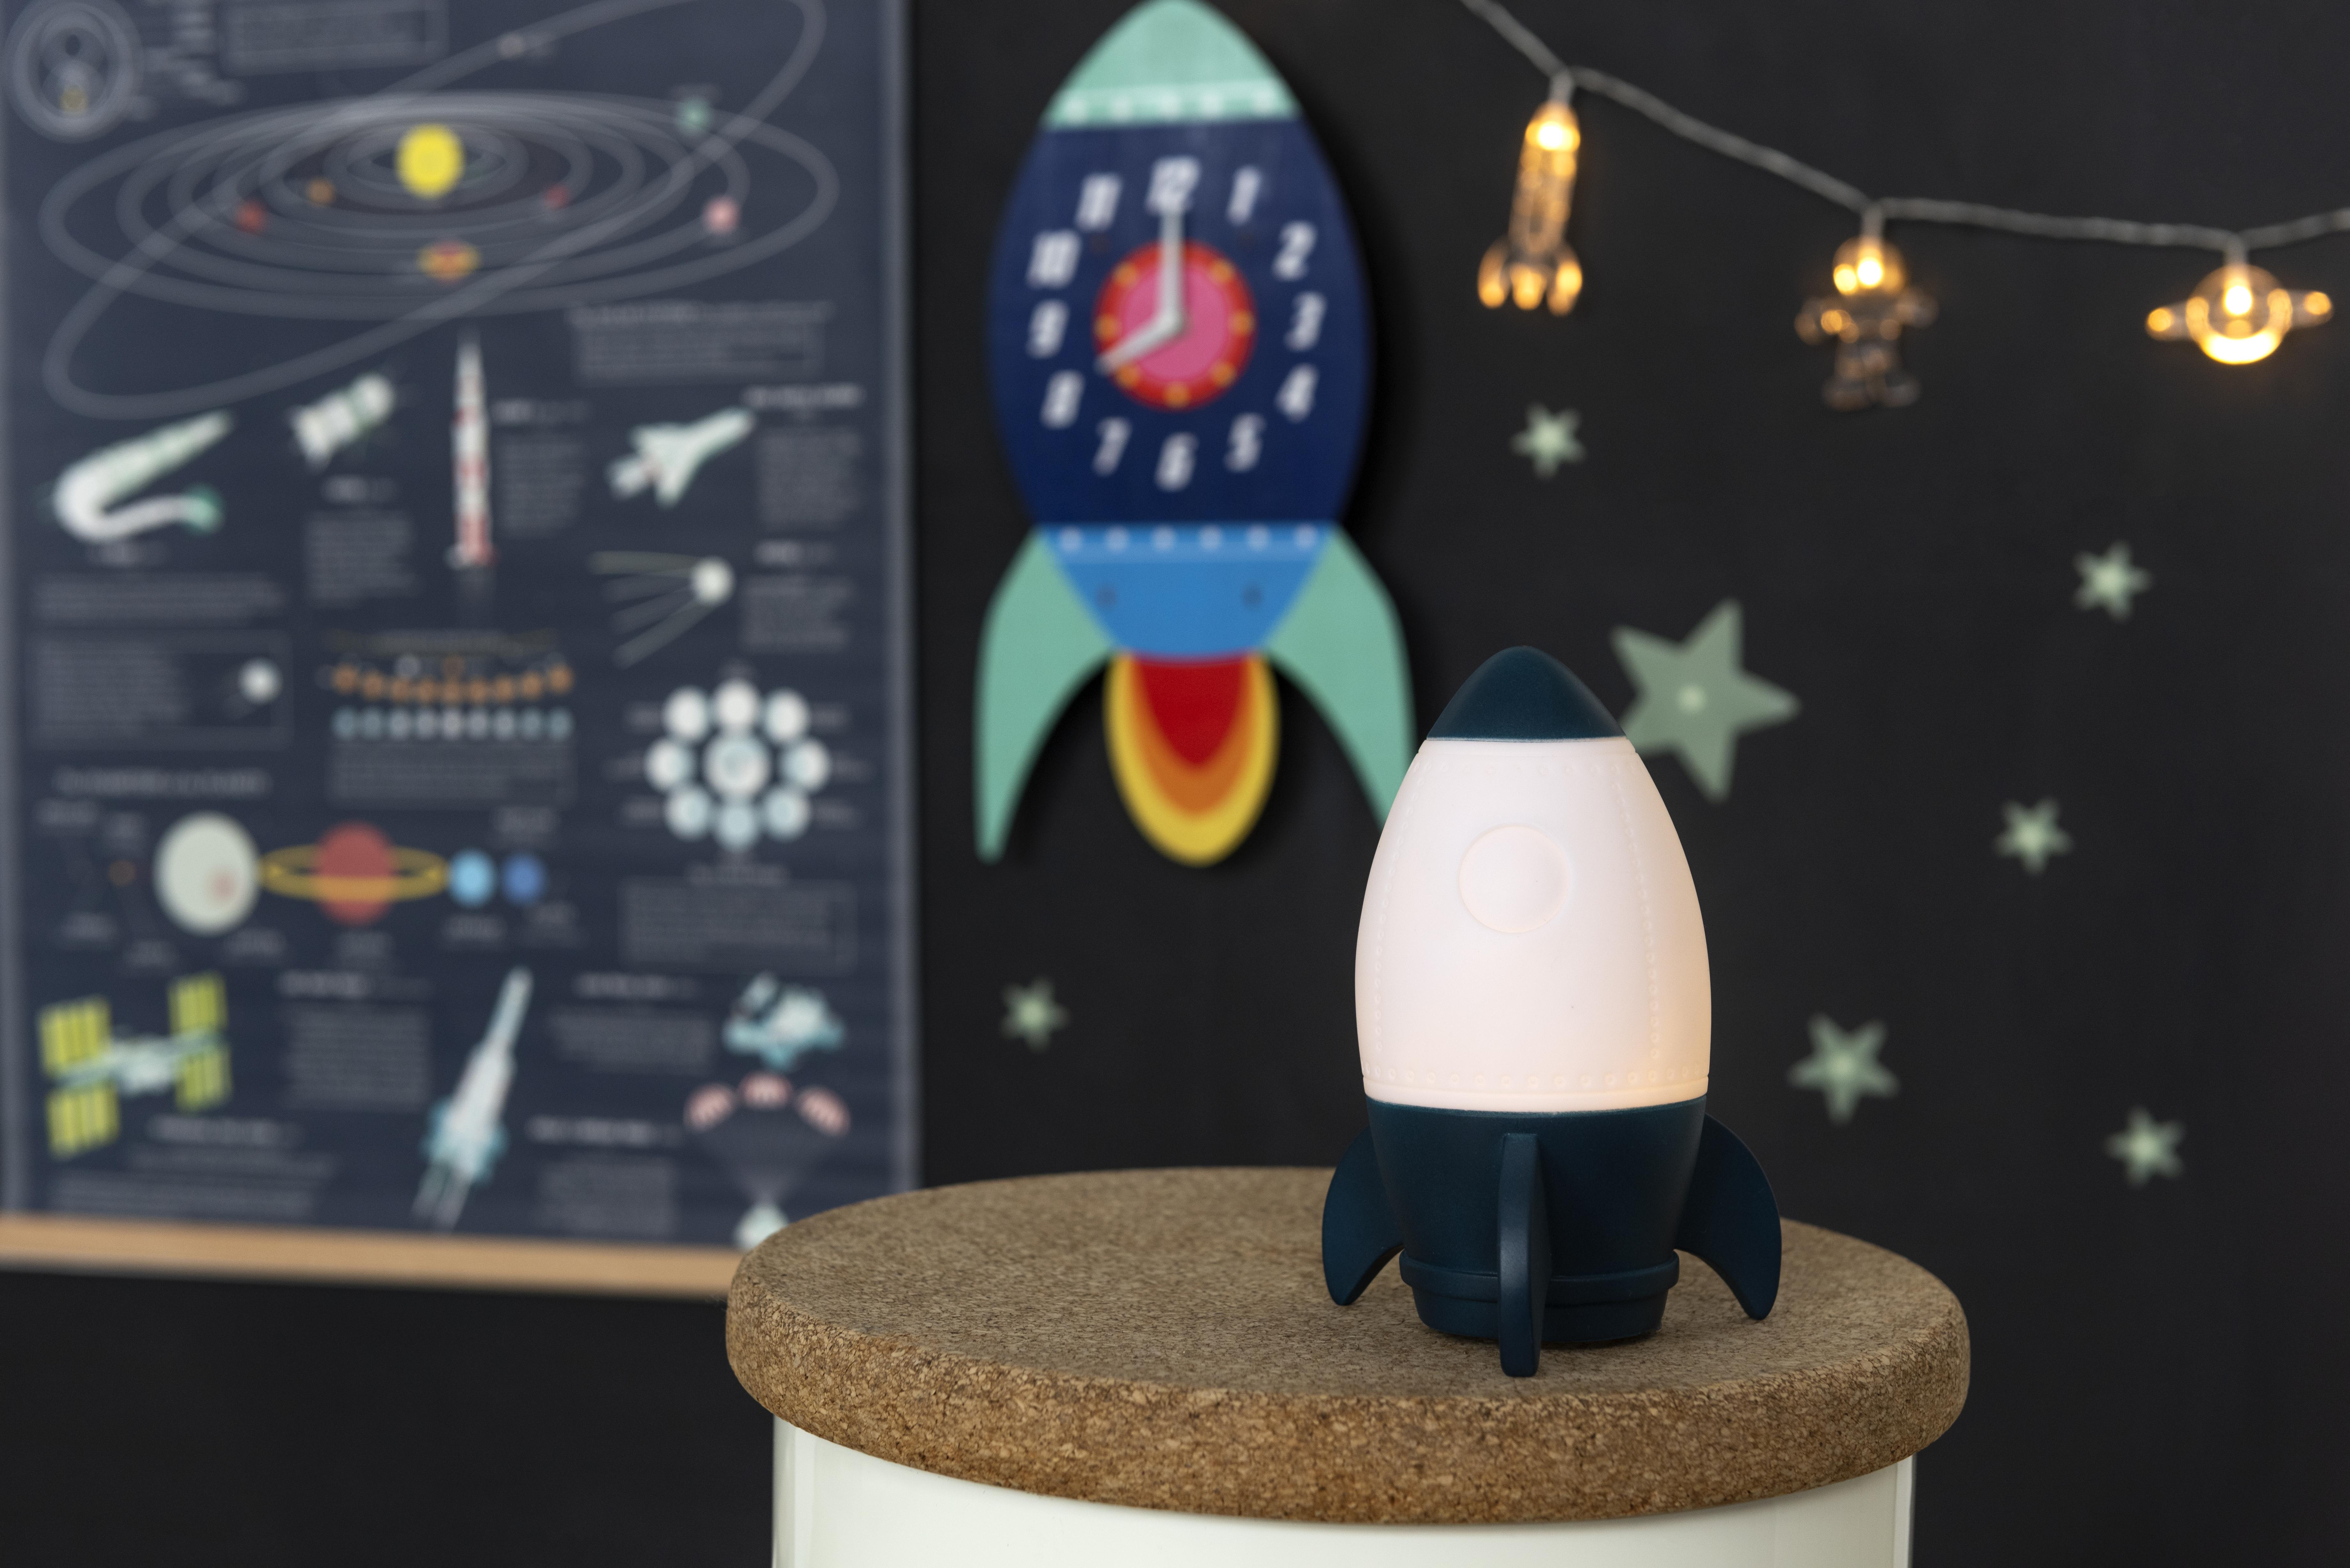 space age bedroom rocket night light